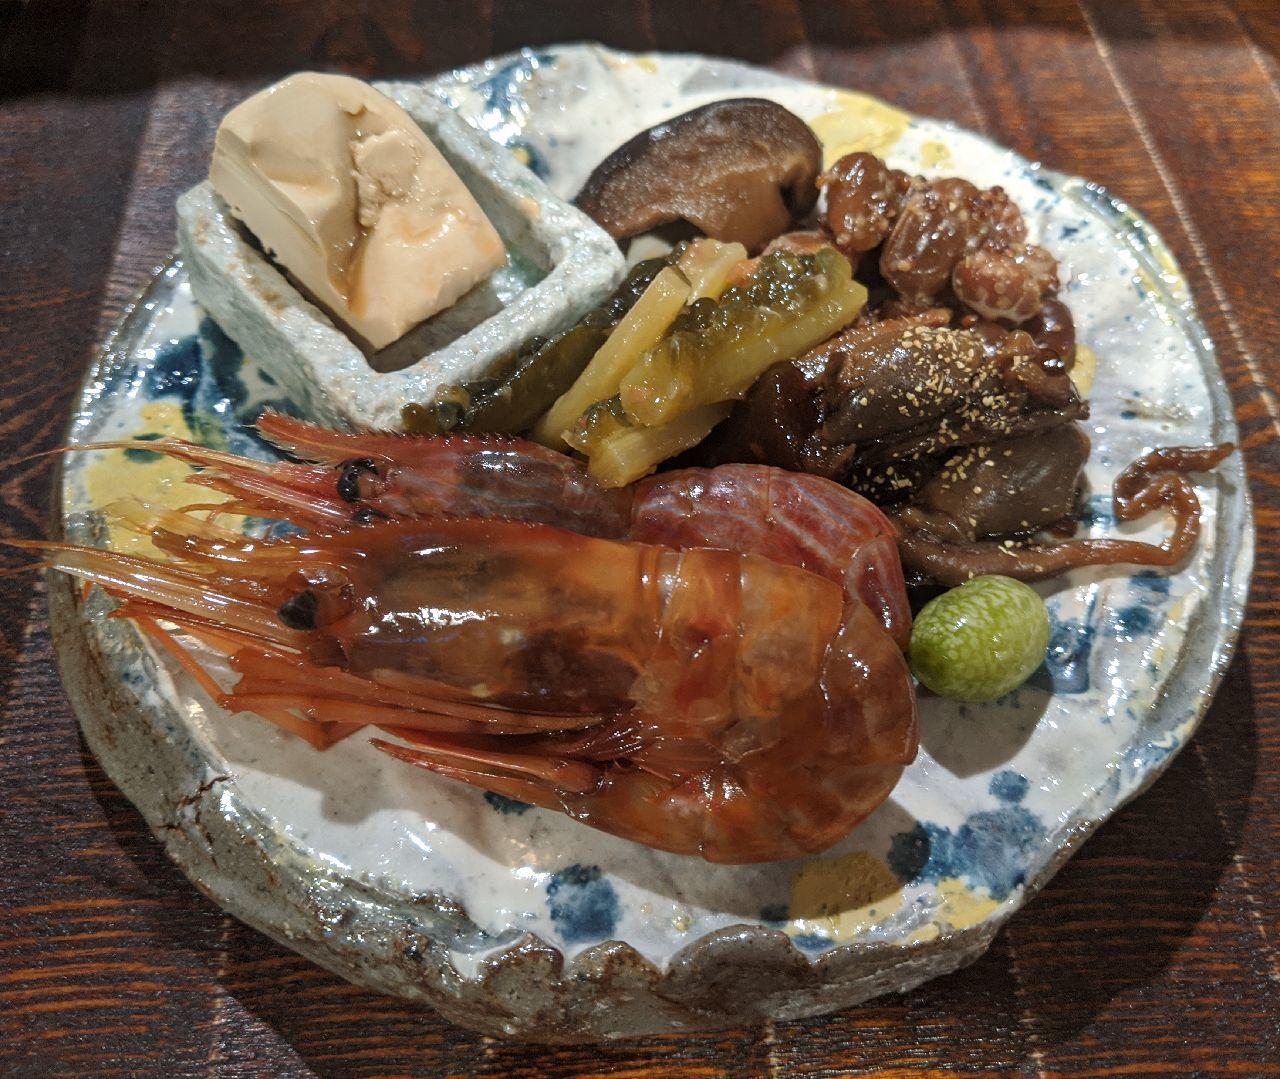 MVIMG_20200926_135720ボタン海老、クリームチーズかえし漬け、鰻肝、マイクロキュウリのピクルス、椎茸